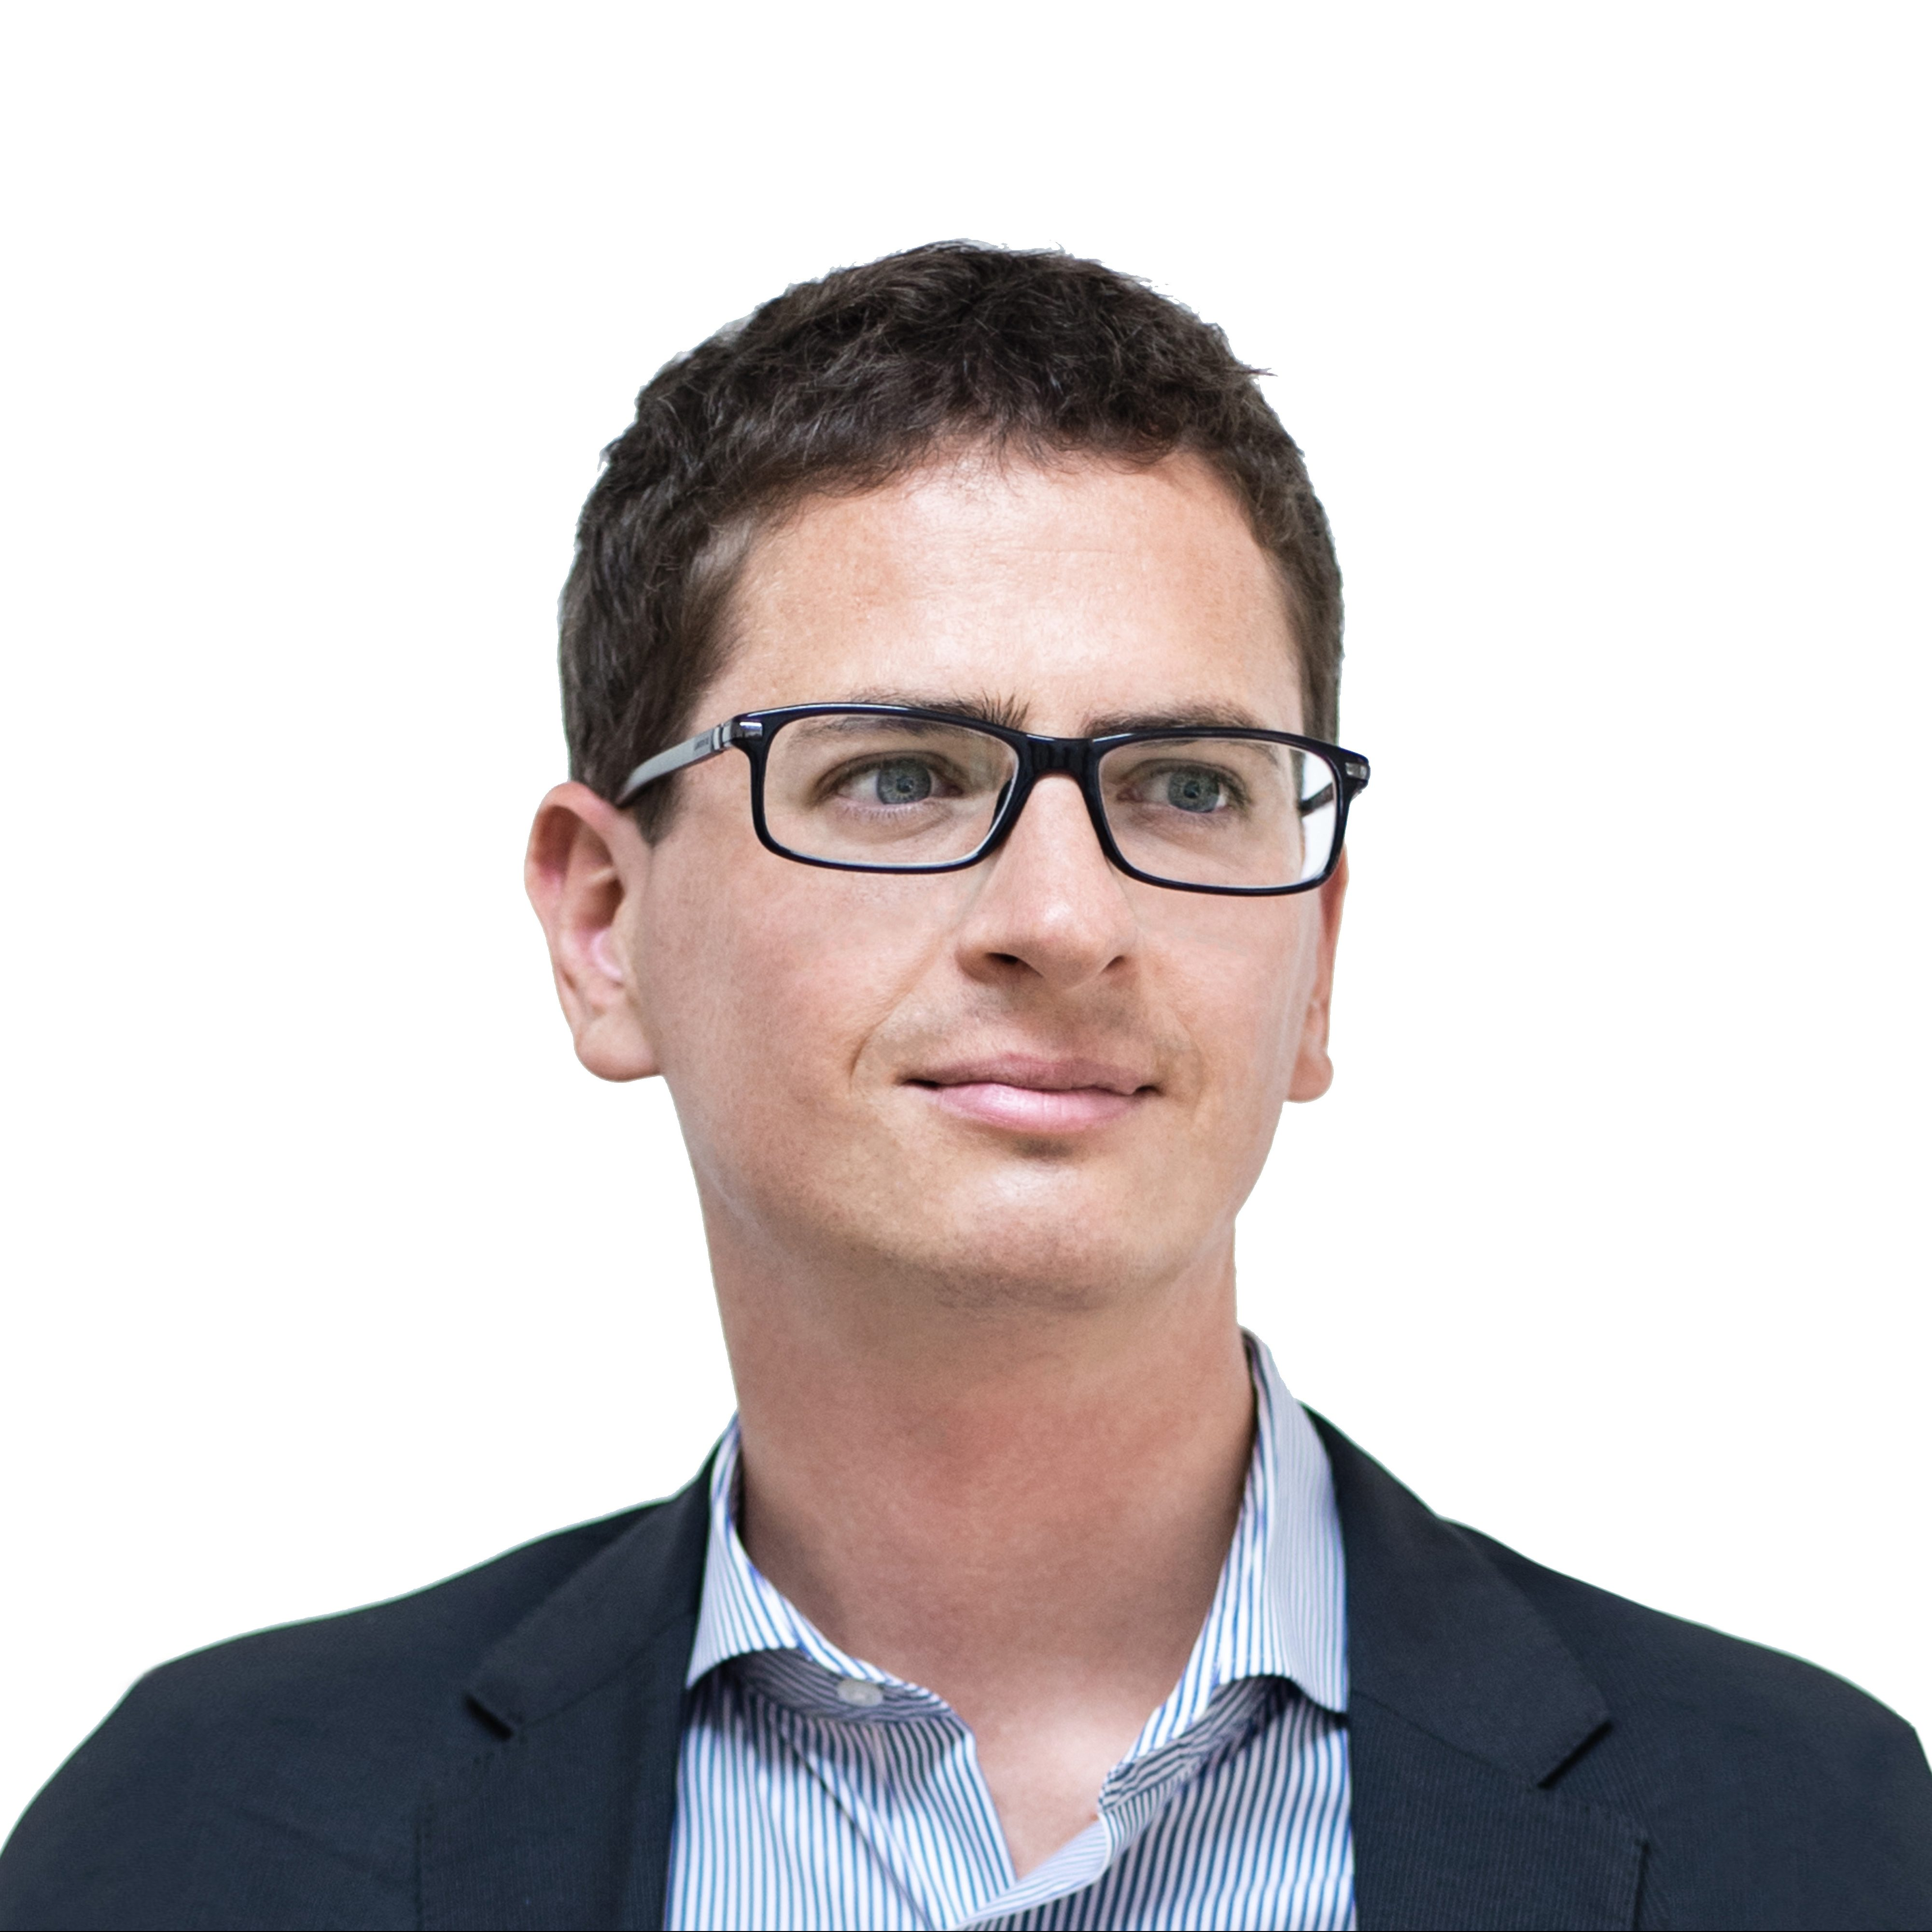 Markus Linder - Ecommerce Influencers